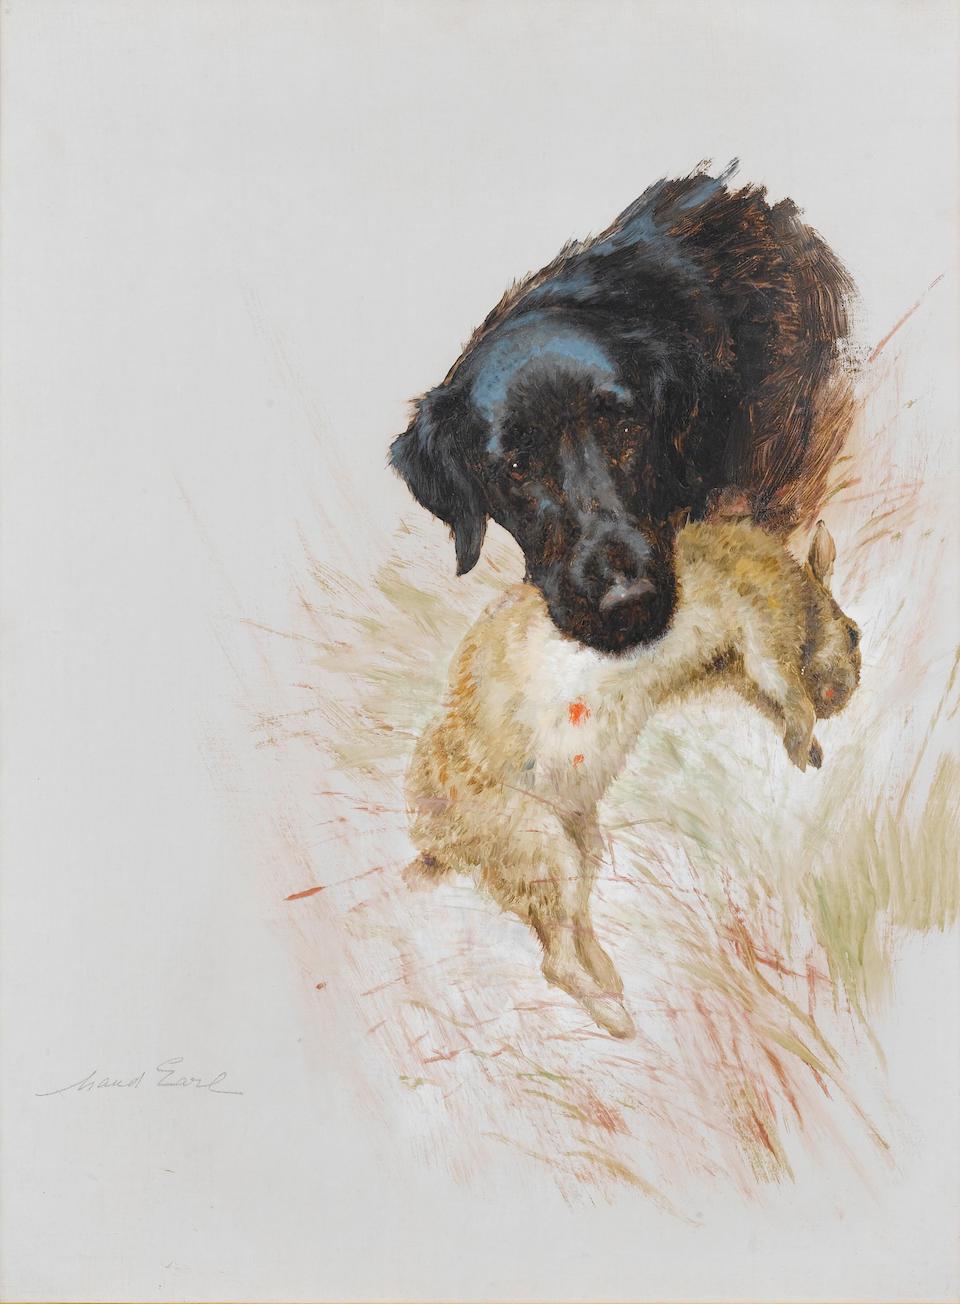 Maud Earl (British, 1863-1943) Retriever with game each 24 x 18 in. (61 x 45.6 cm.) (2)